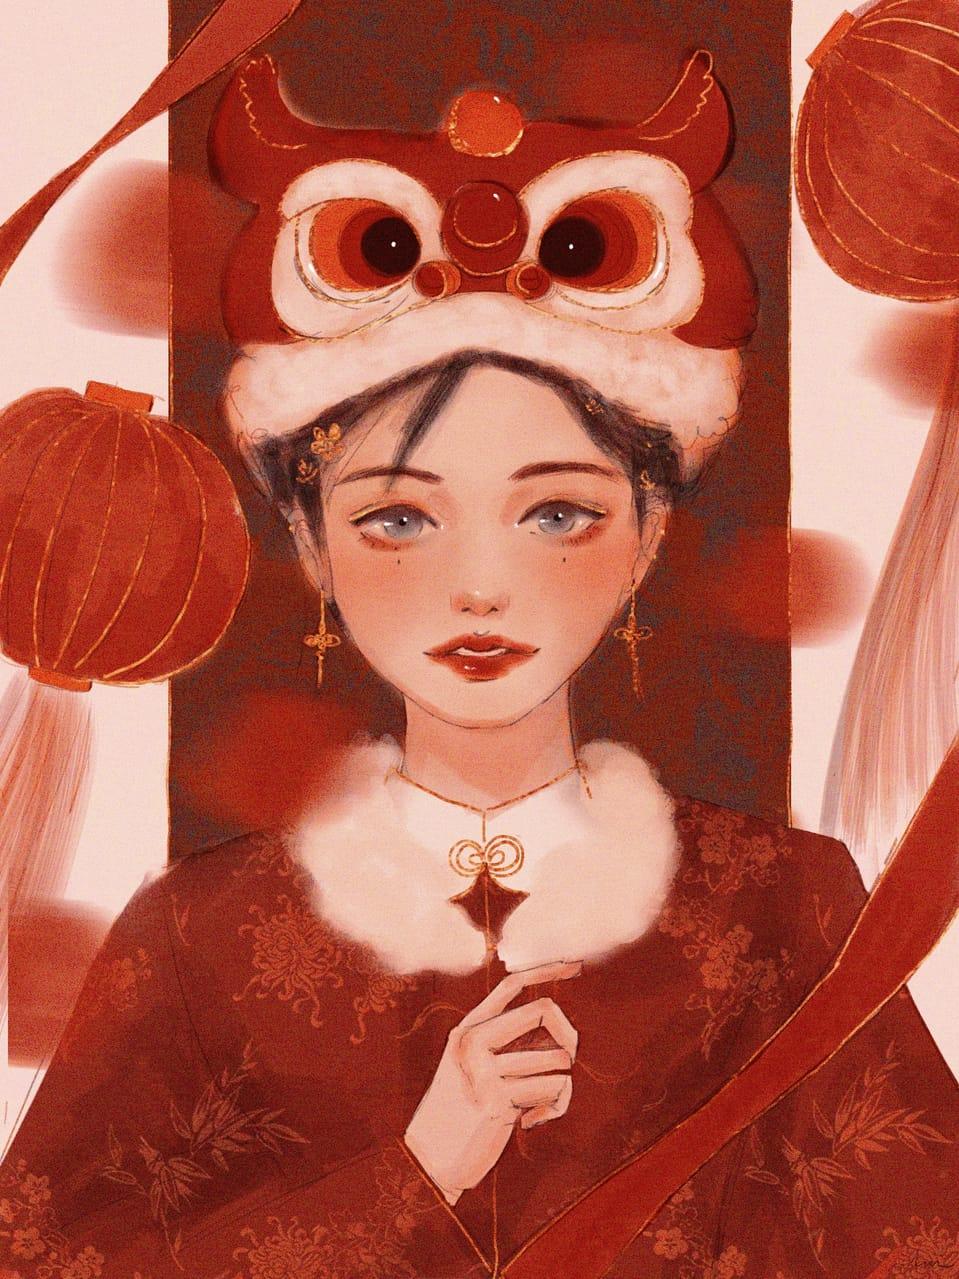 Spring Festival 2021 Illust of Jiayi red 2021 girl chinesenewyear chinese Lion original liondance Chinese lantern